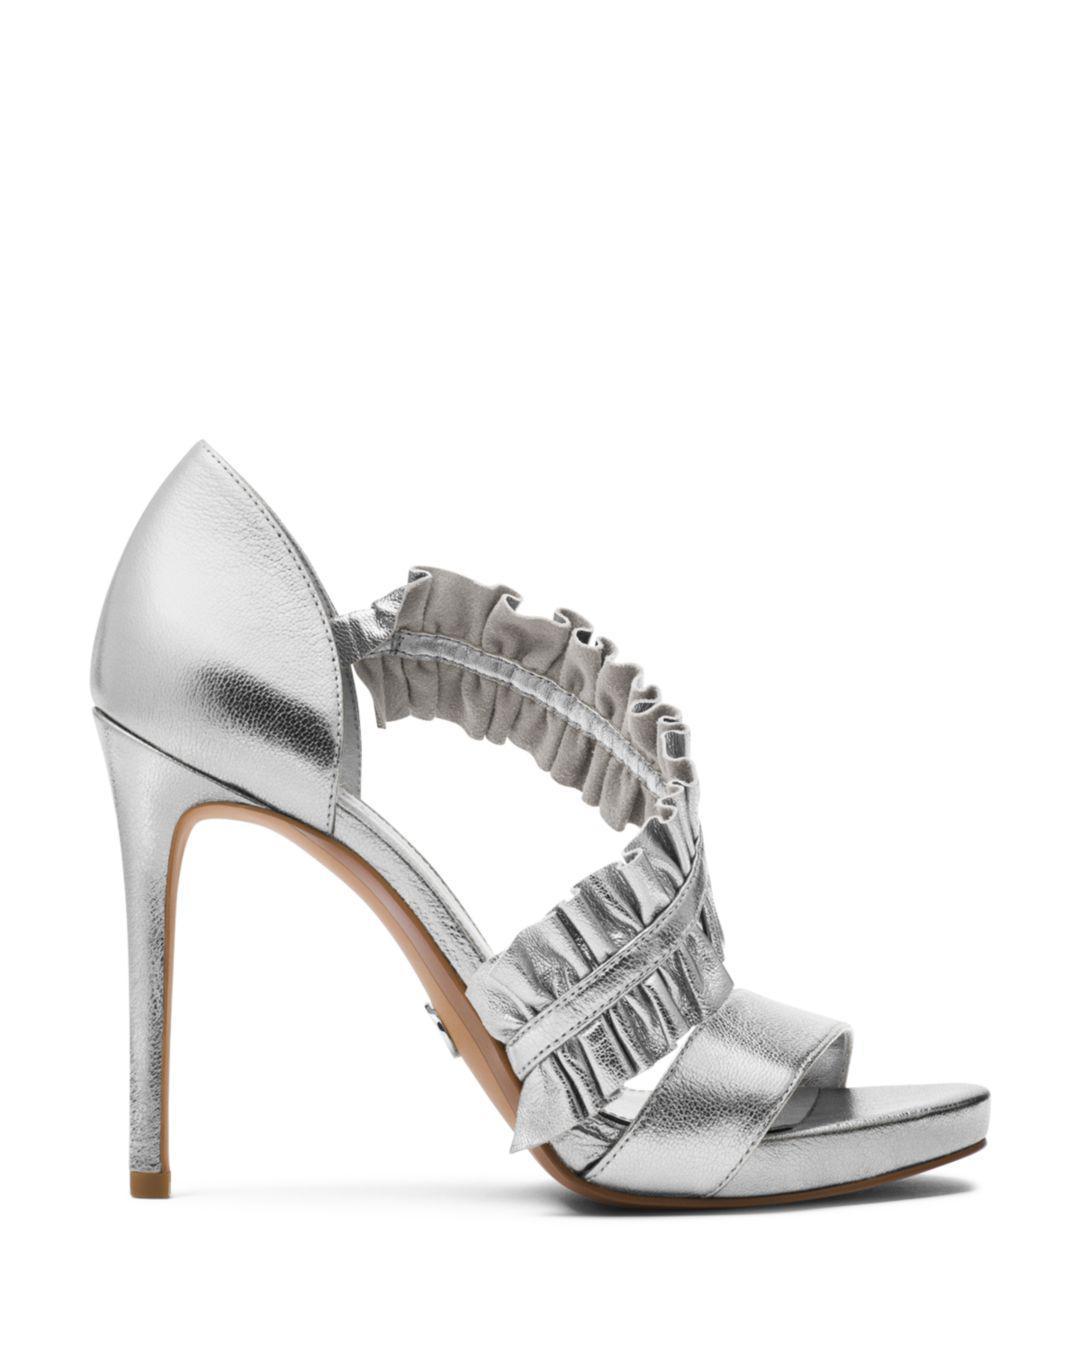 927495f7eb0a Michael Michael Kors Women s Bella Ruffled Leather Platform High ...